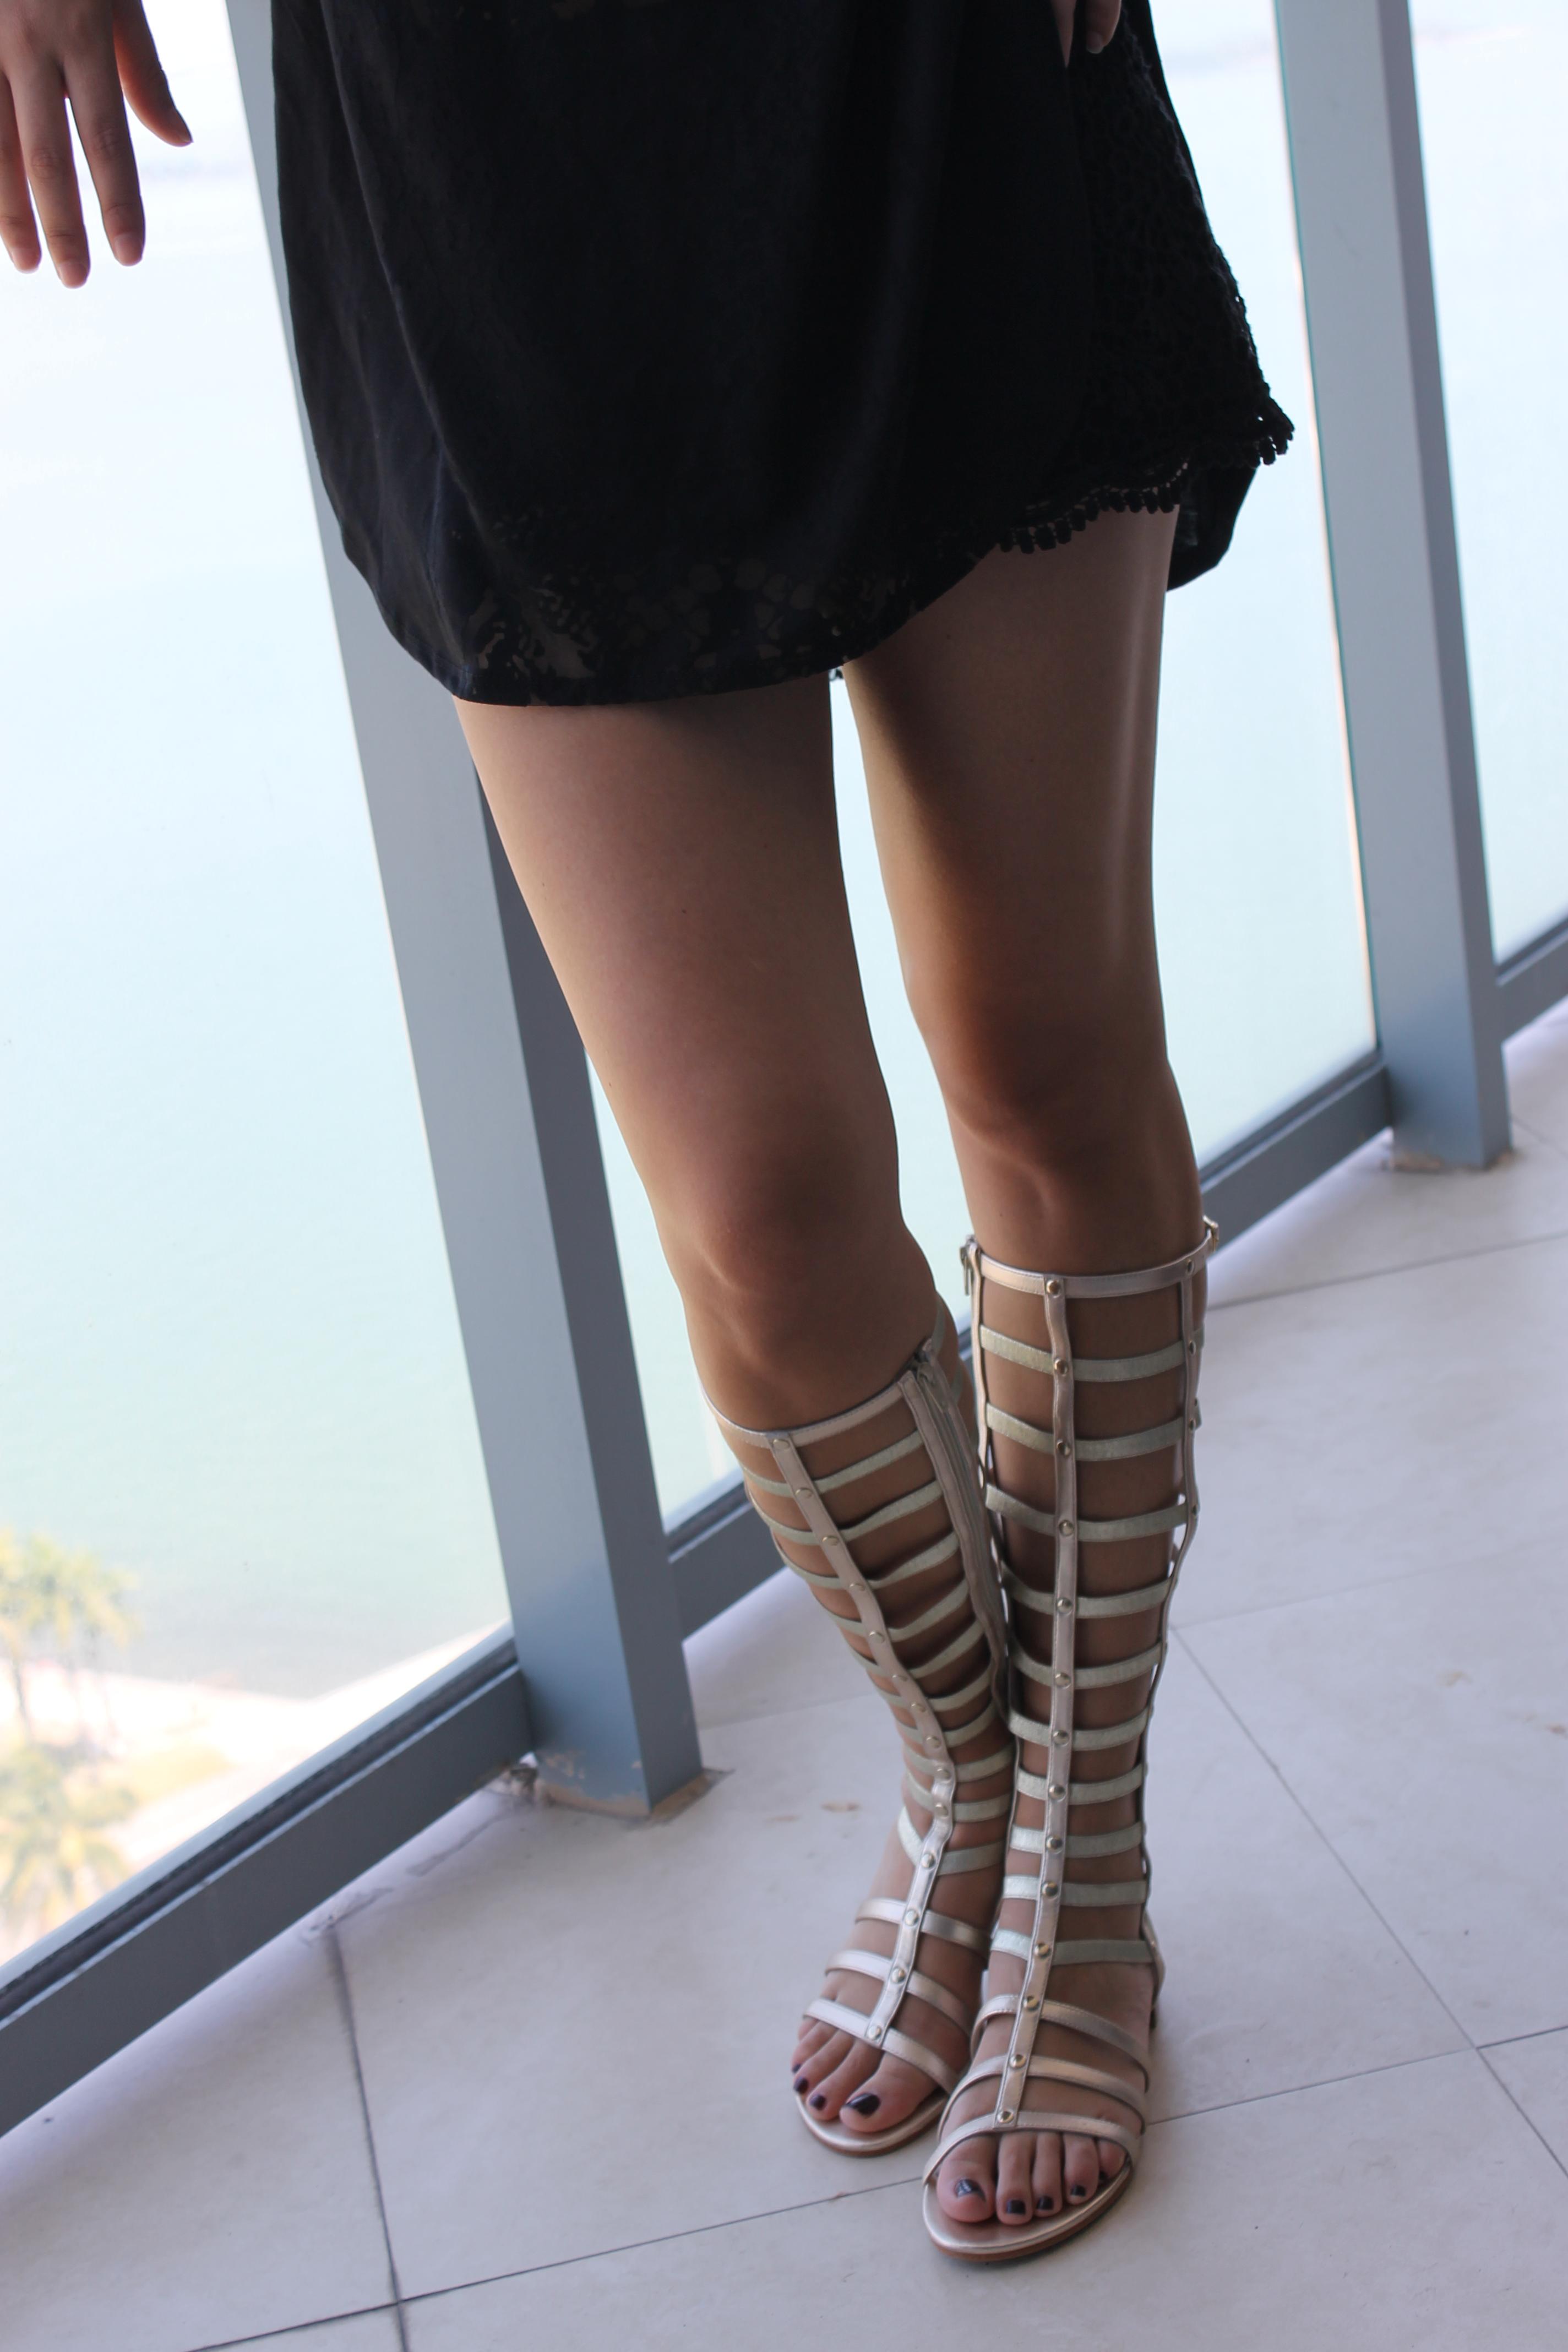 clearance wholesale price Stuart Weitzman Metallic Gladiator Sandals cheap online UHvv2